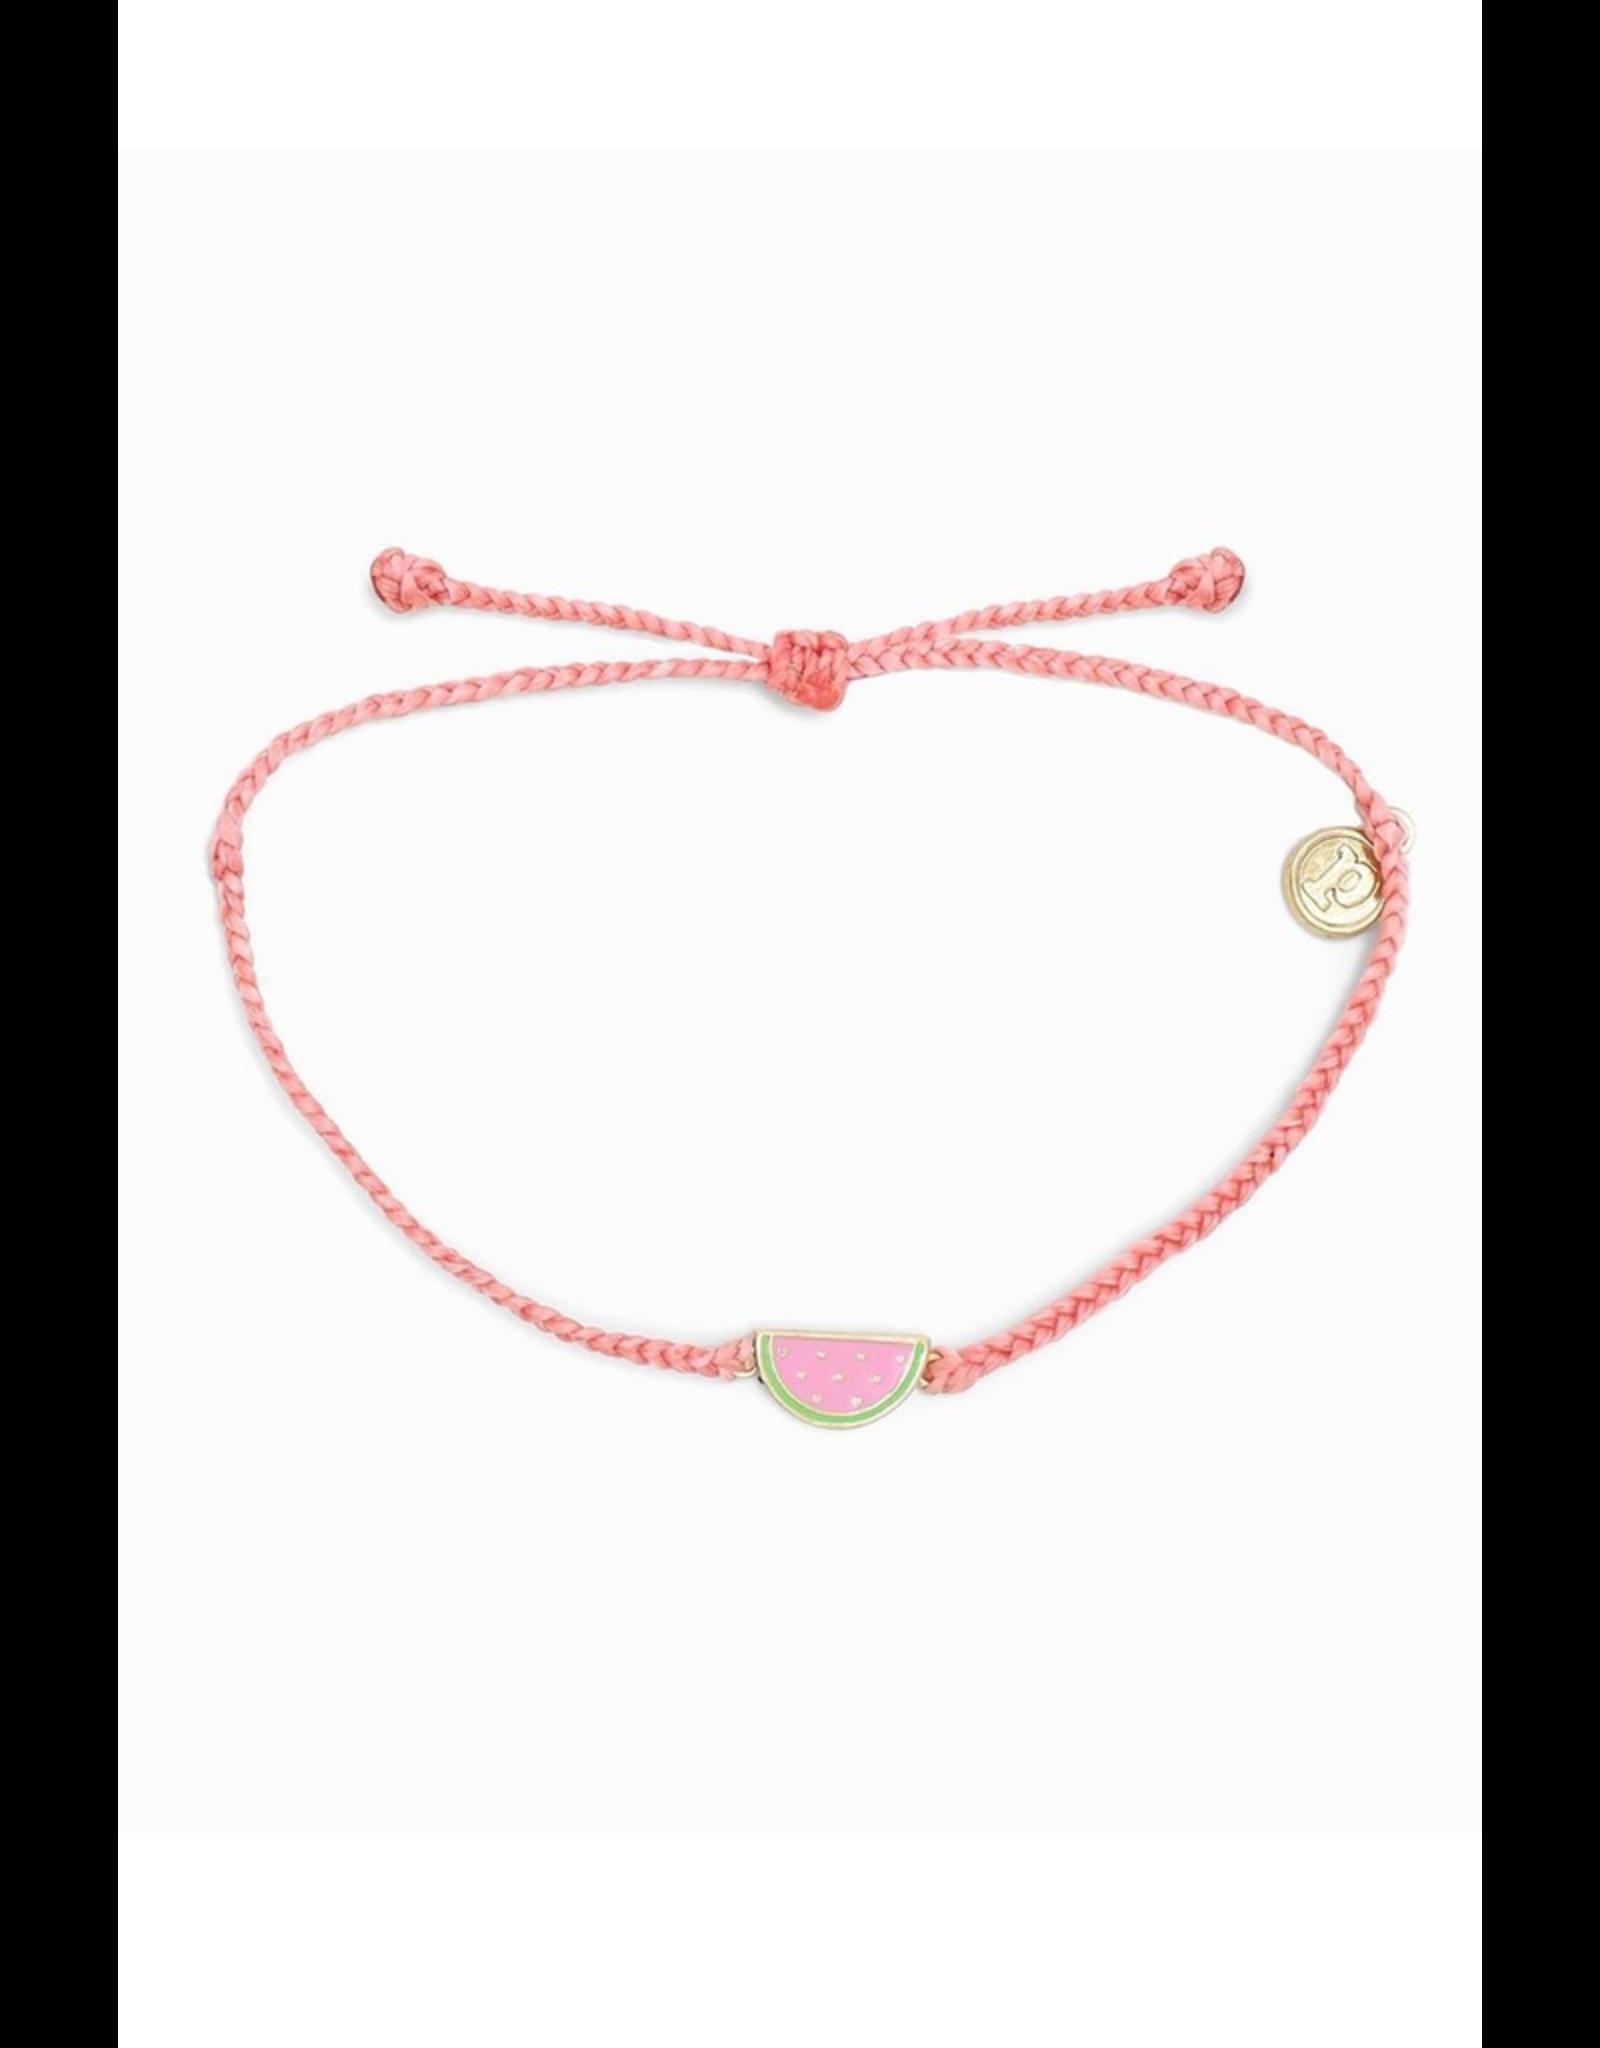 PURA VIDA Pura Vida Watermelon Charm Bracelet